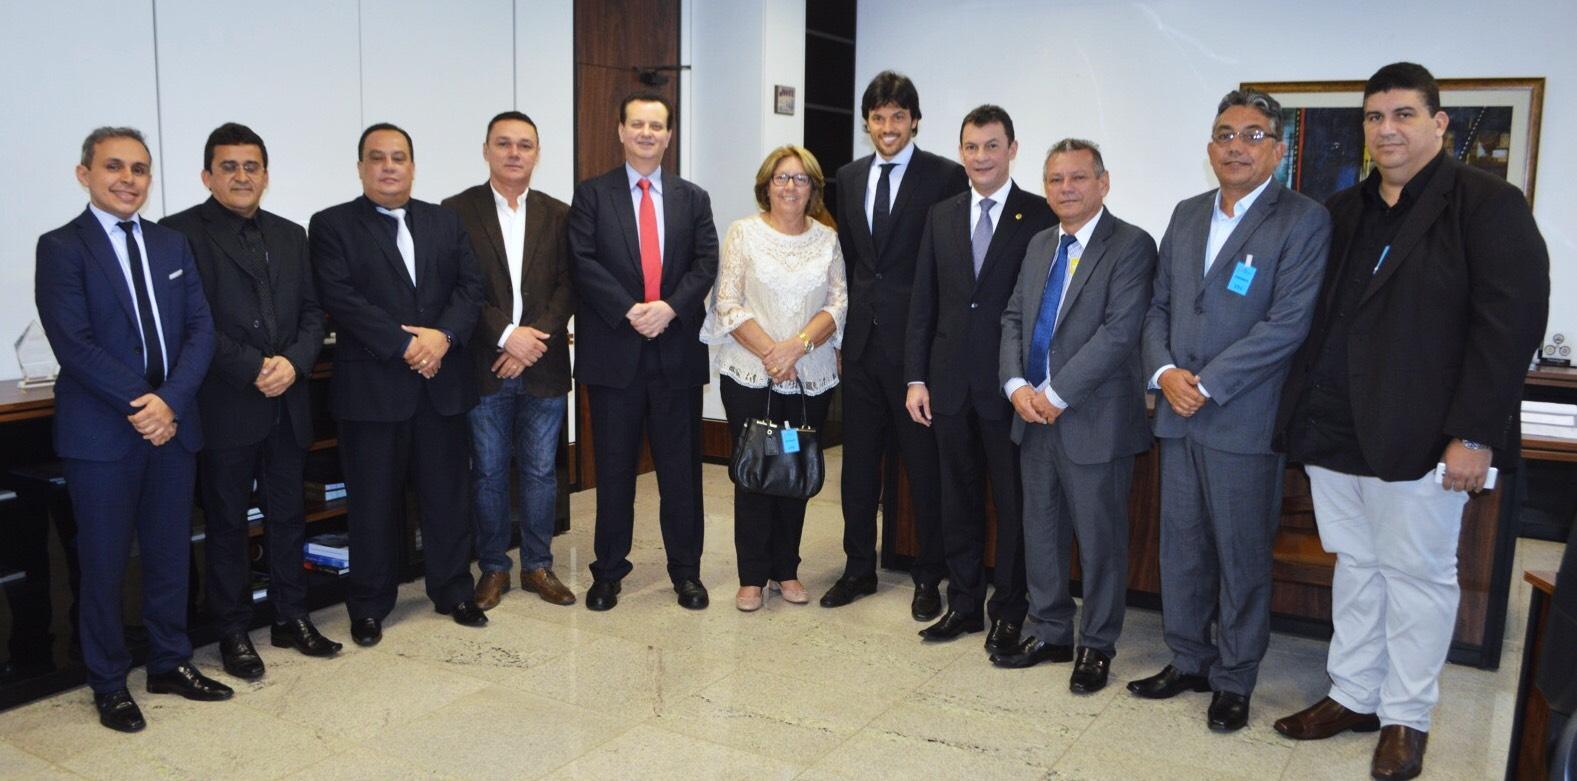 Gilberto Kassab e Fábio Faria ladeados por prefeitos potiguares